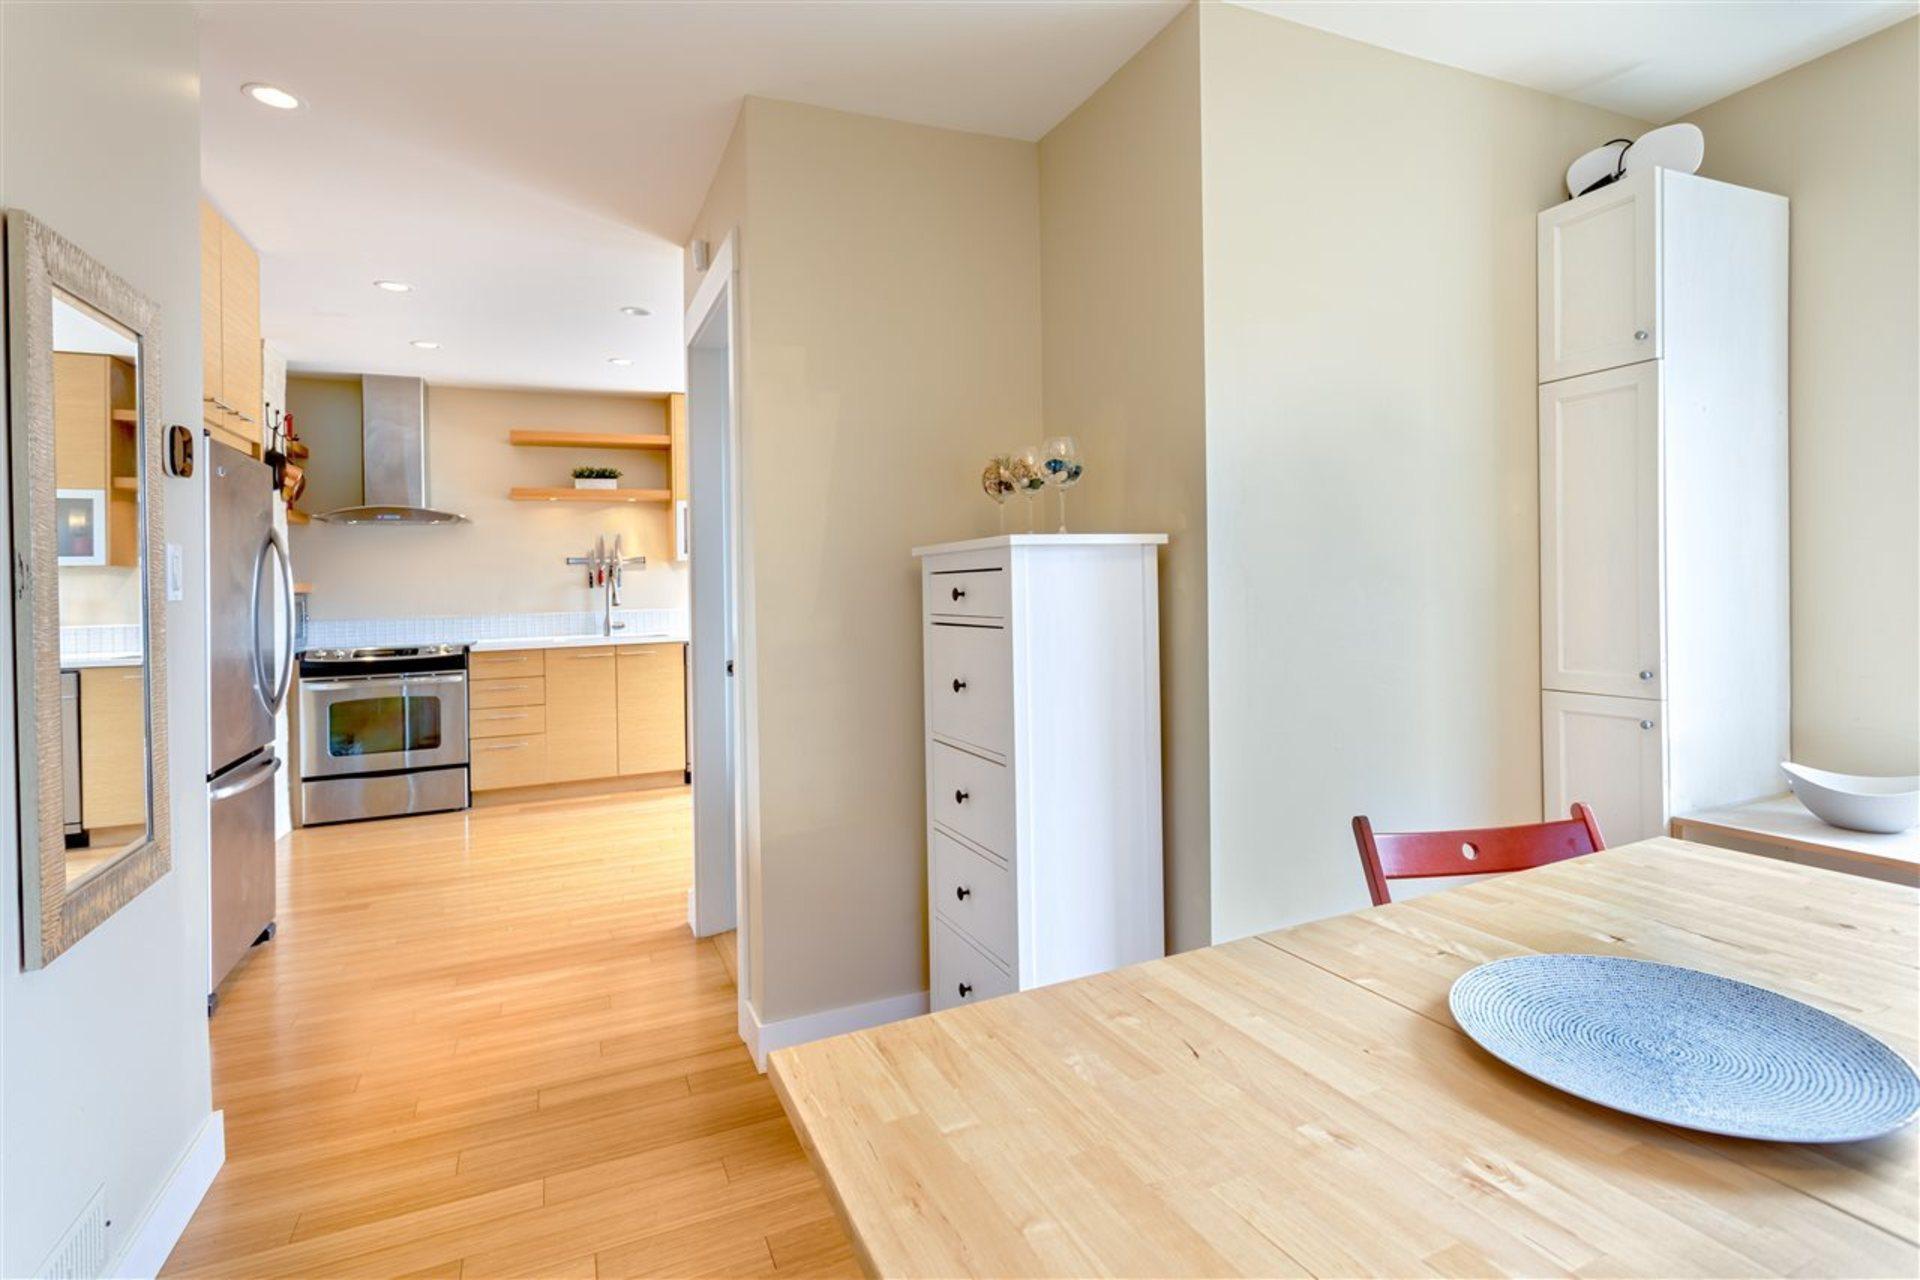 3912-parker-street-willingdon-heights-burnaby-north-09 at 3912 Parker Street, Willingdon Heights, Burnaby North